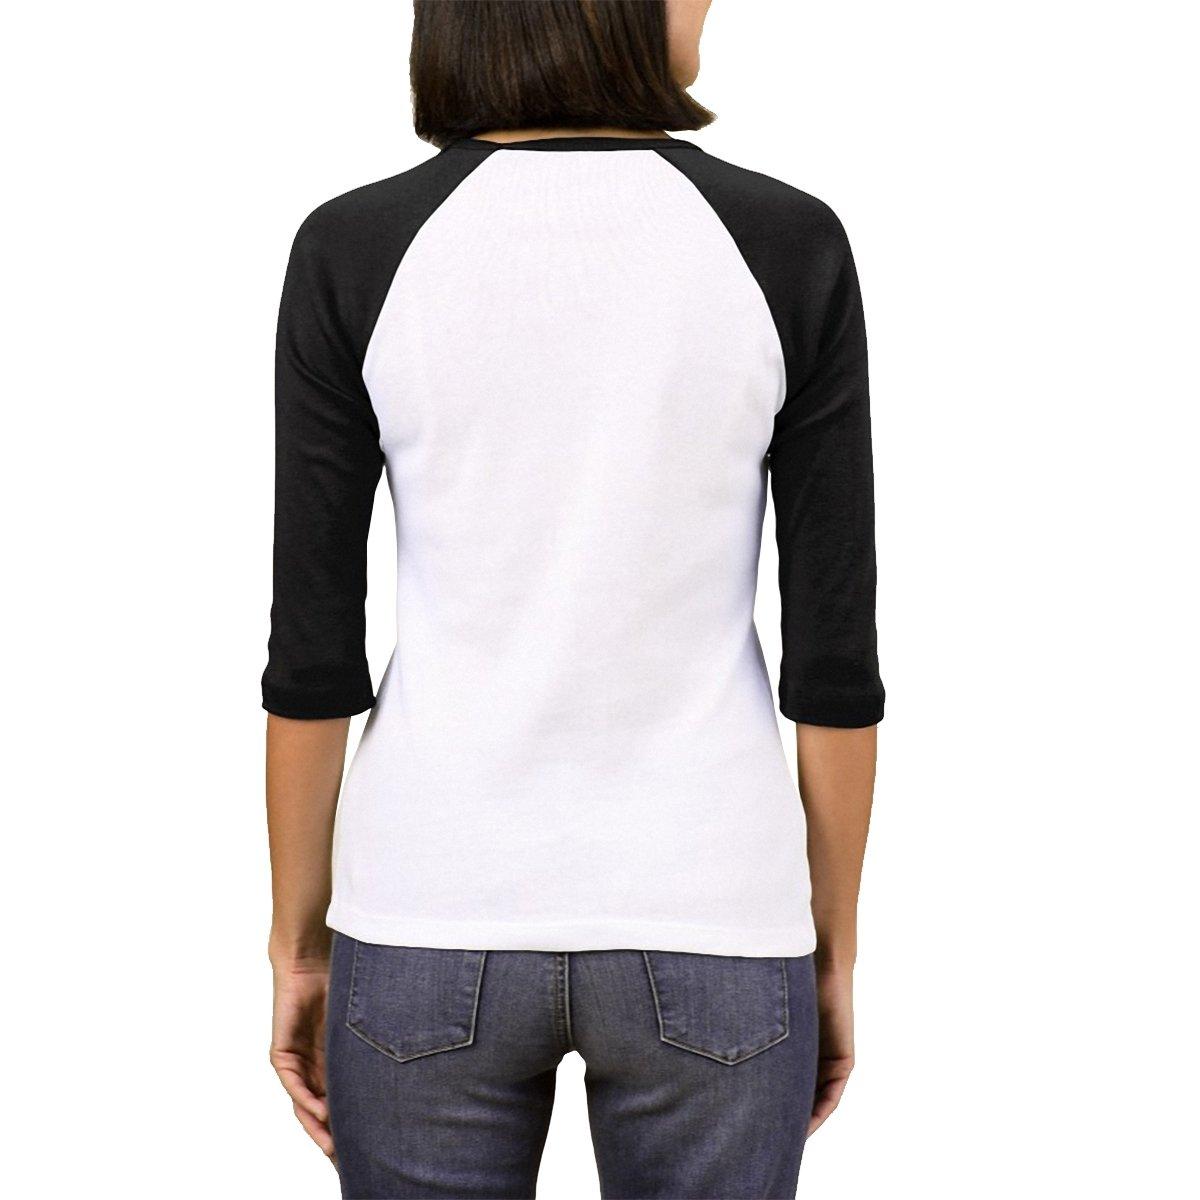 Preto Raglan Chess Branco Feminina Camiseta Clothing e Raglan Camiseta EYpqwHqx